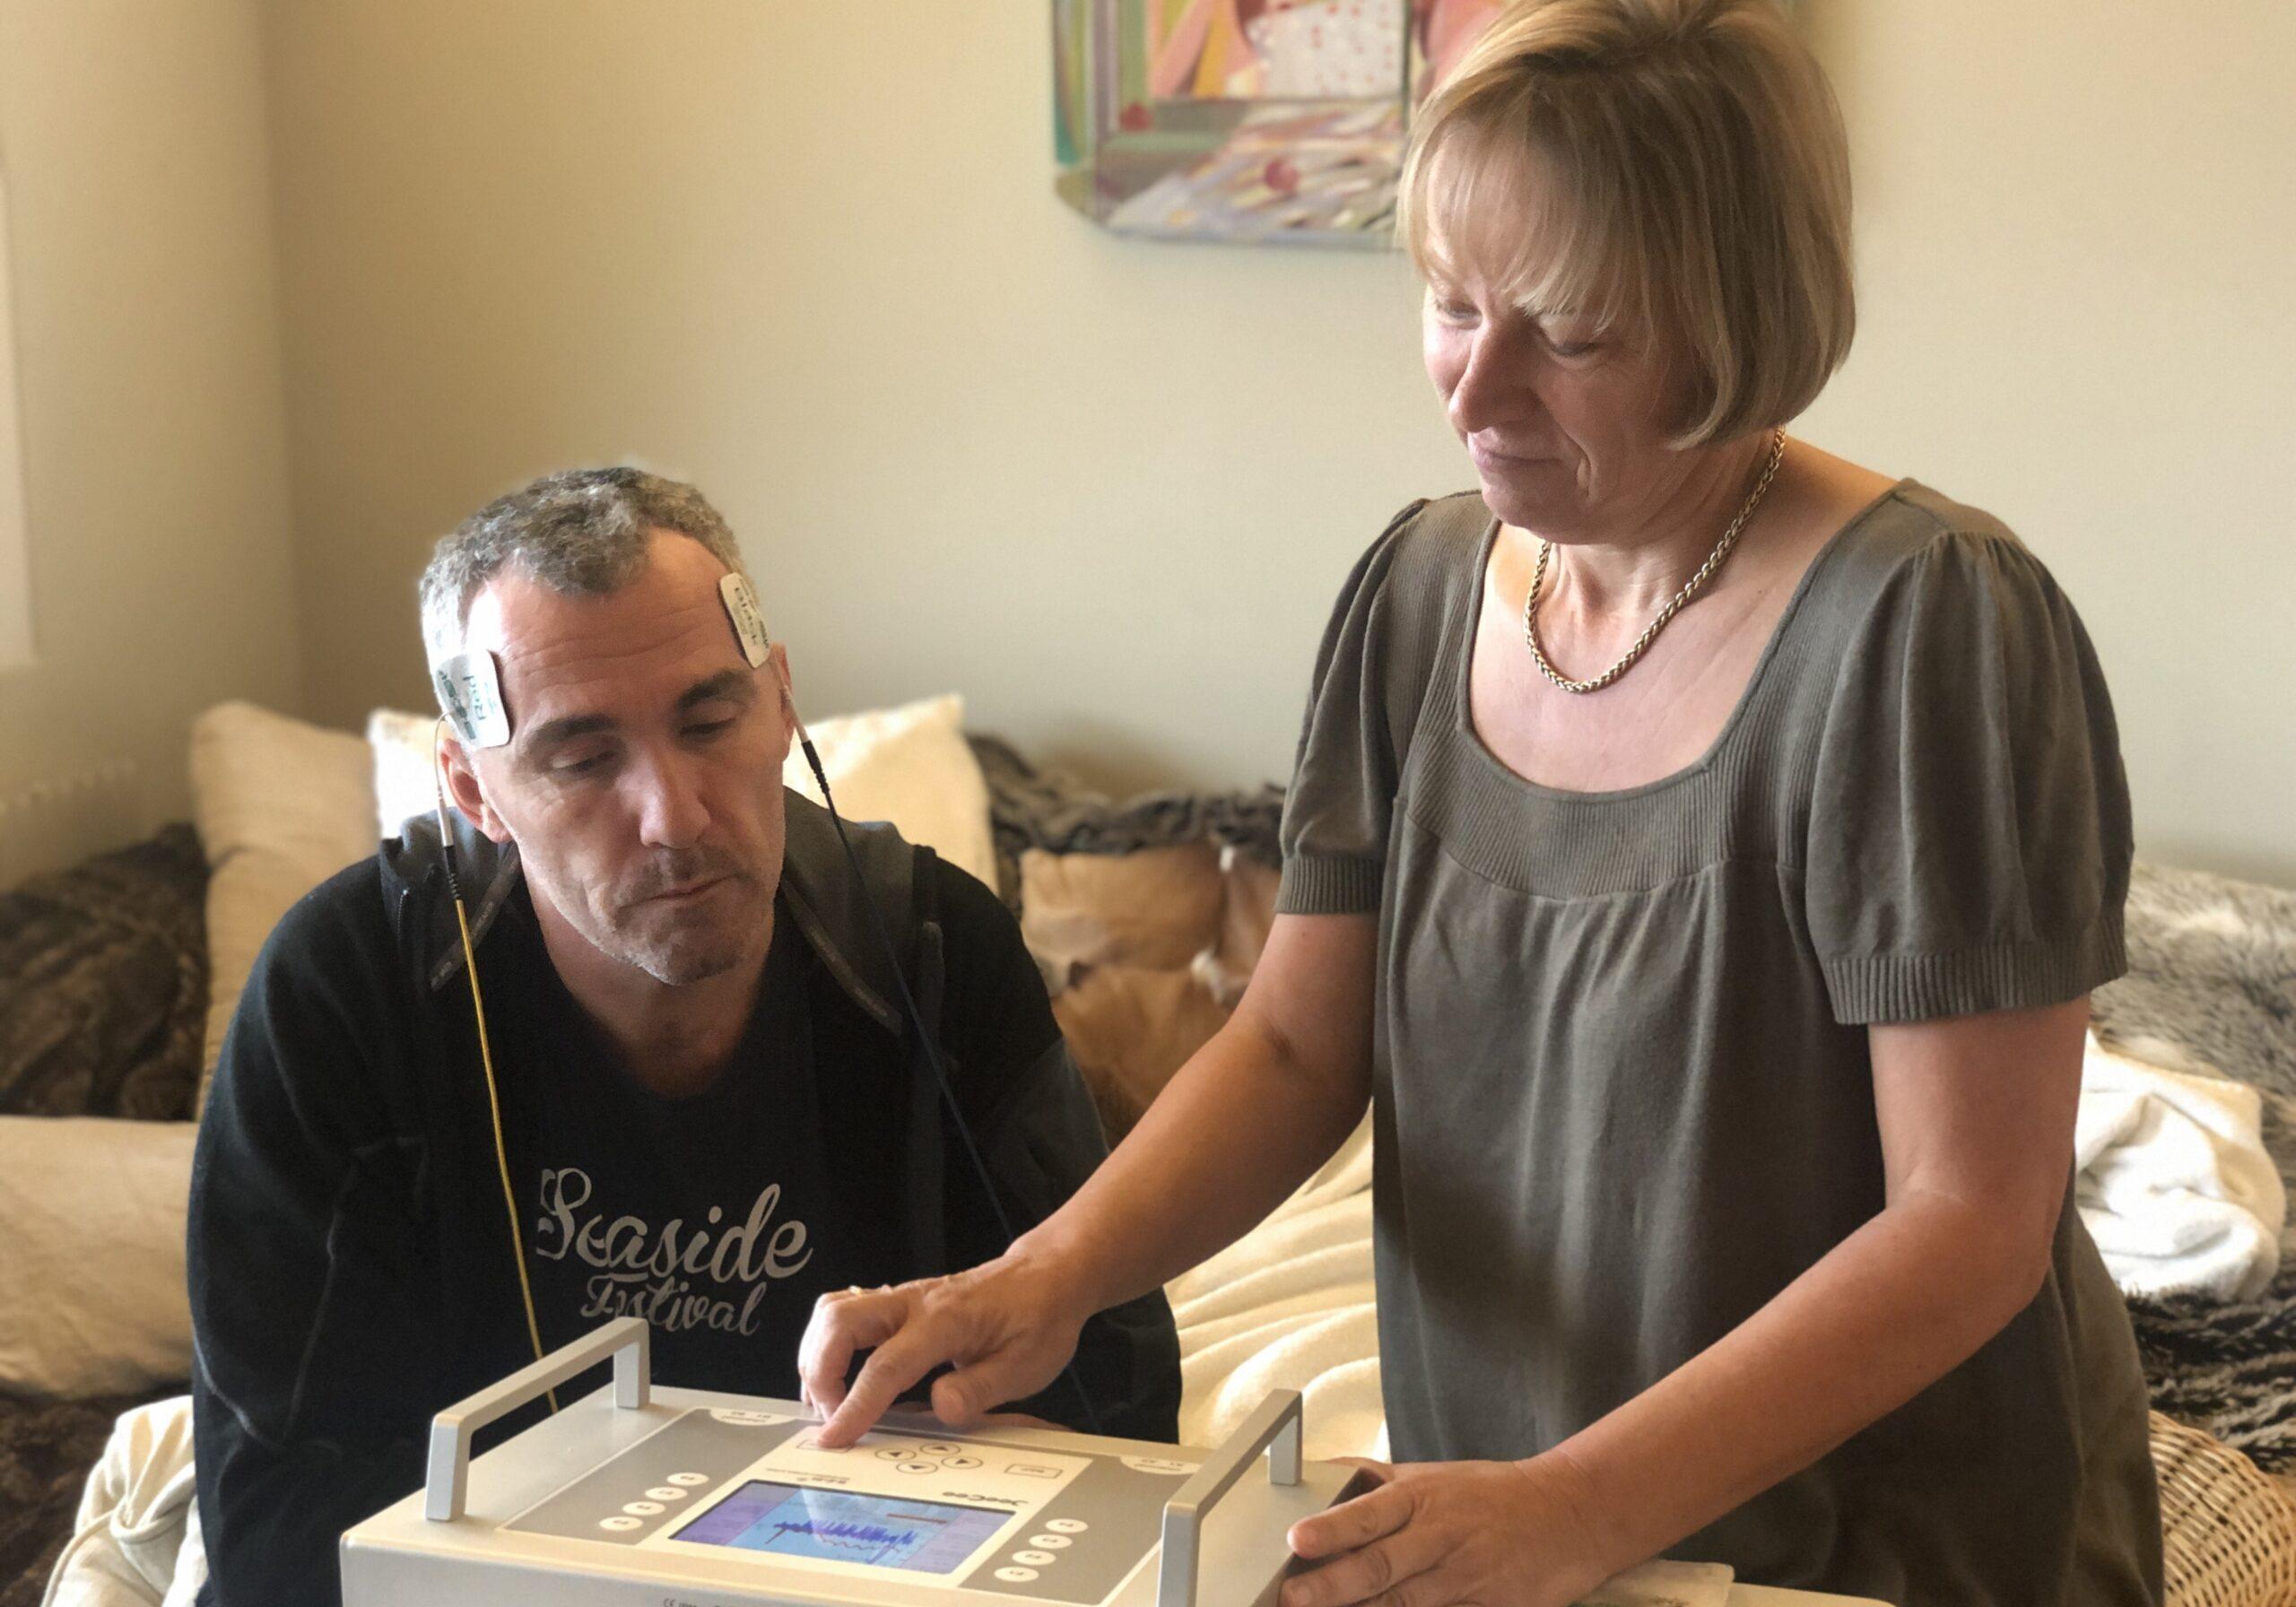 Mikrostrom-Zelltherapie: Erklärung des Geräts